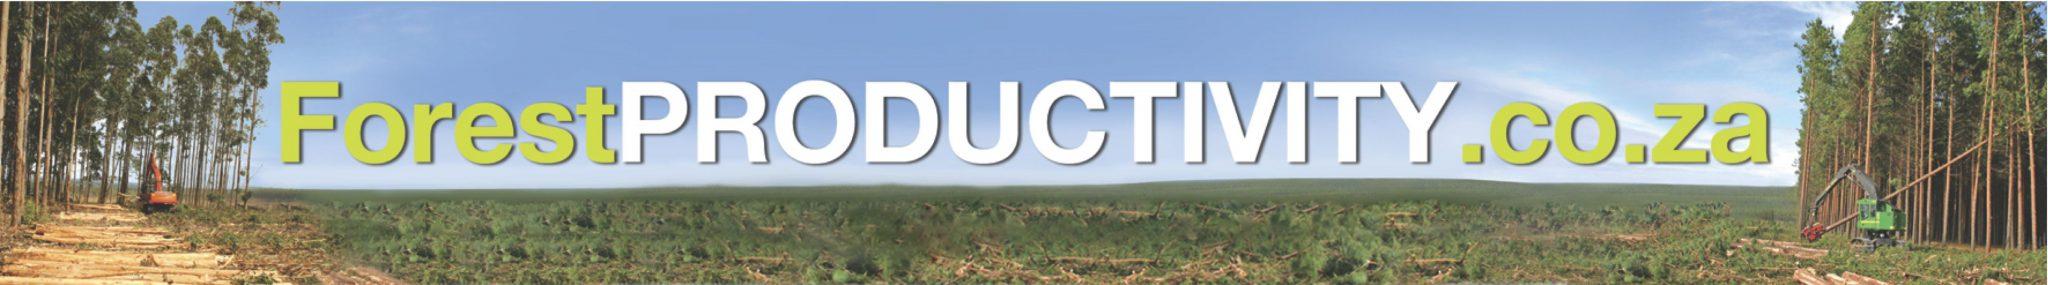 Forestproductivity